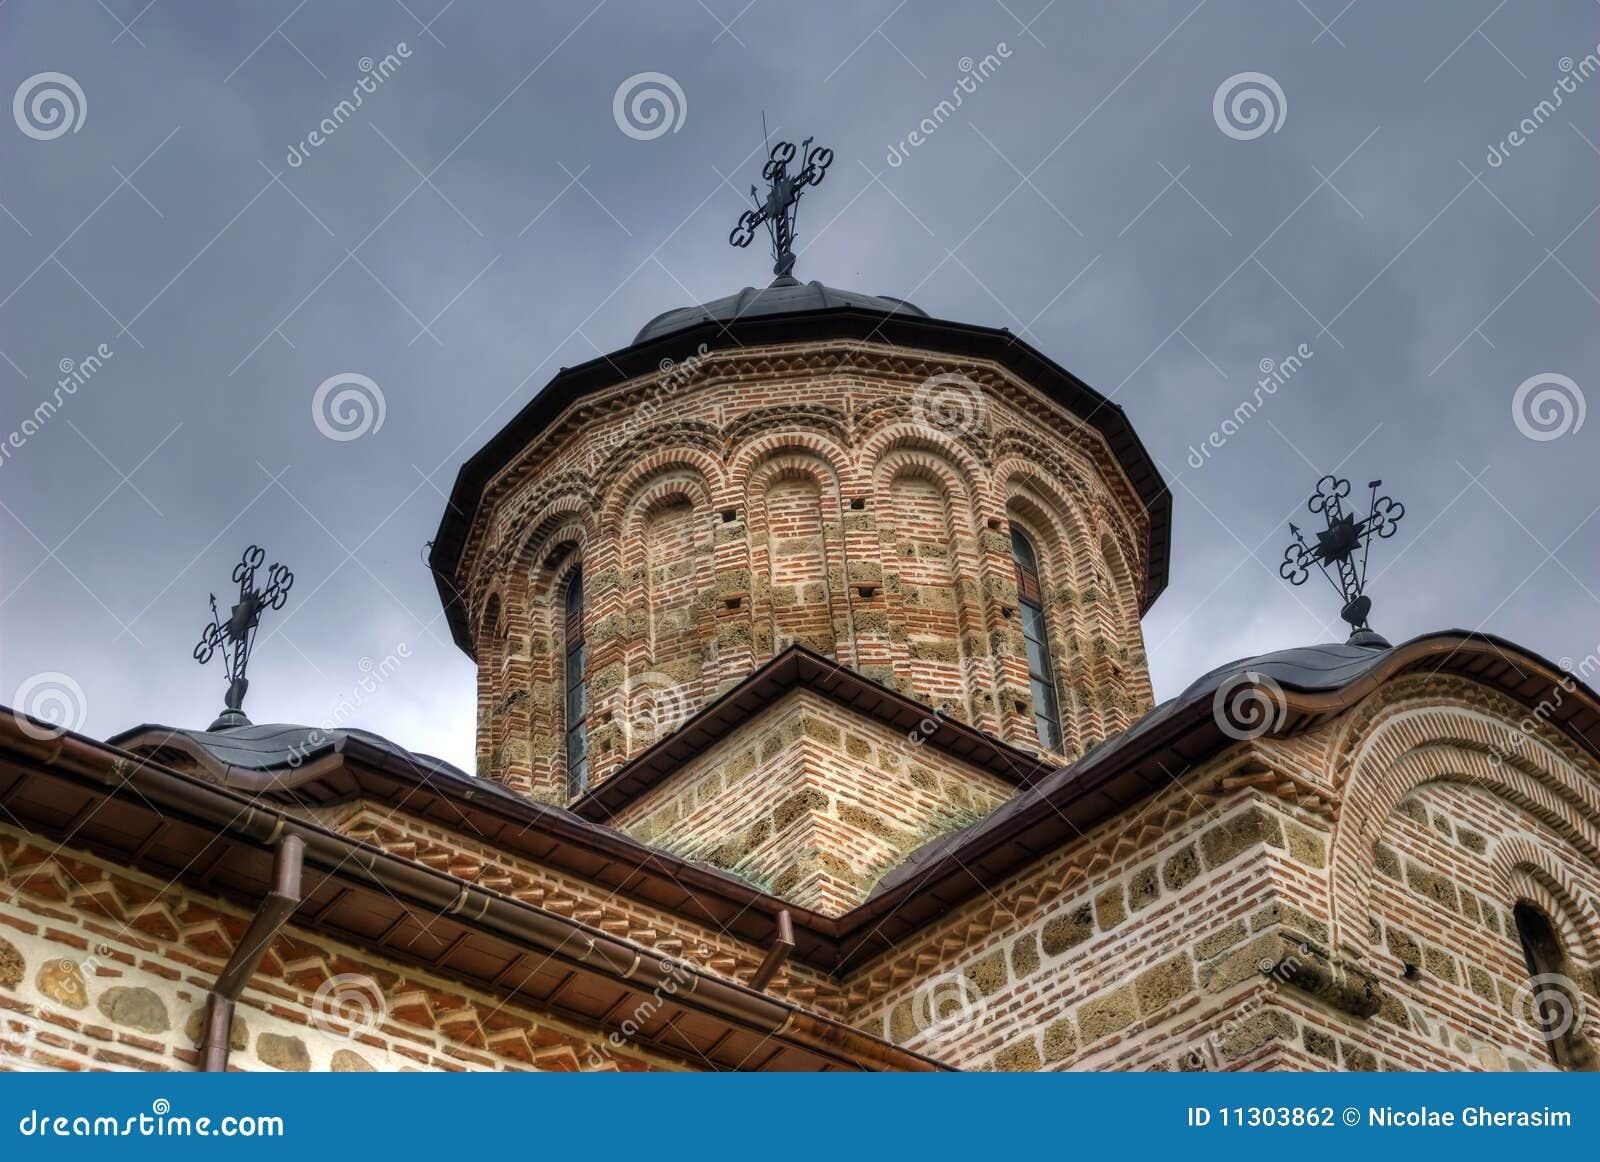 Alte orthodoxe christliche Kirche